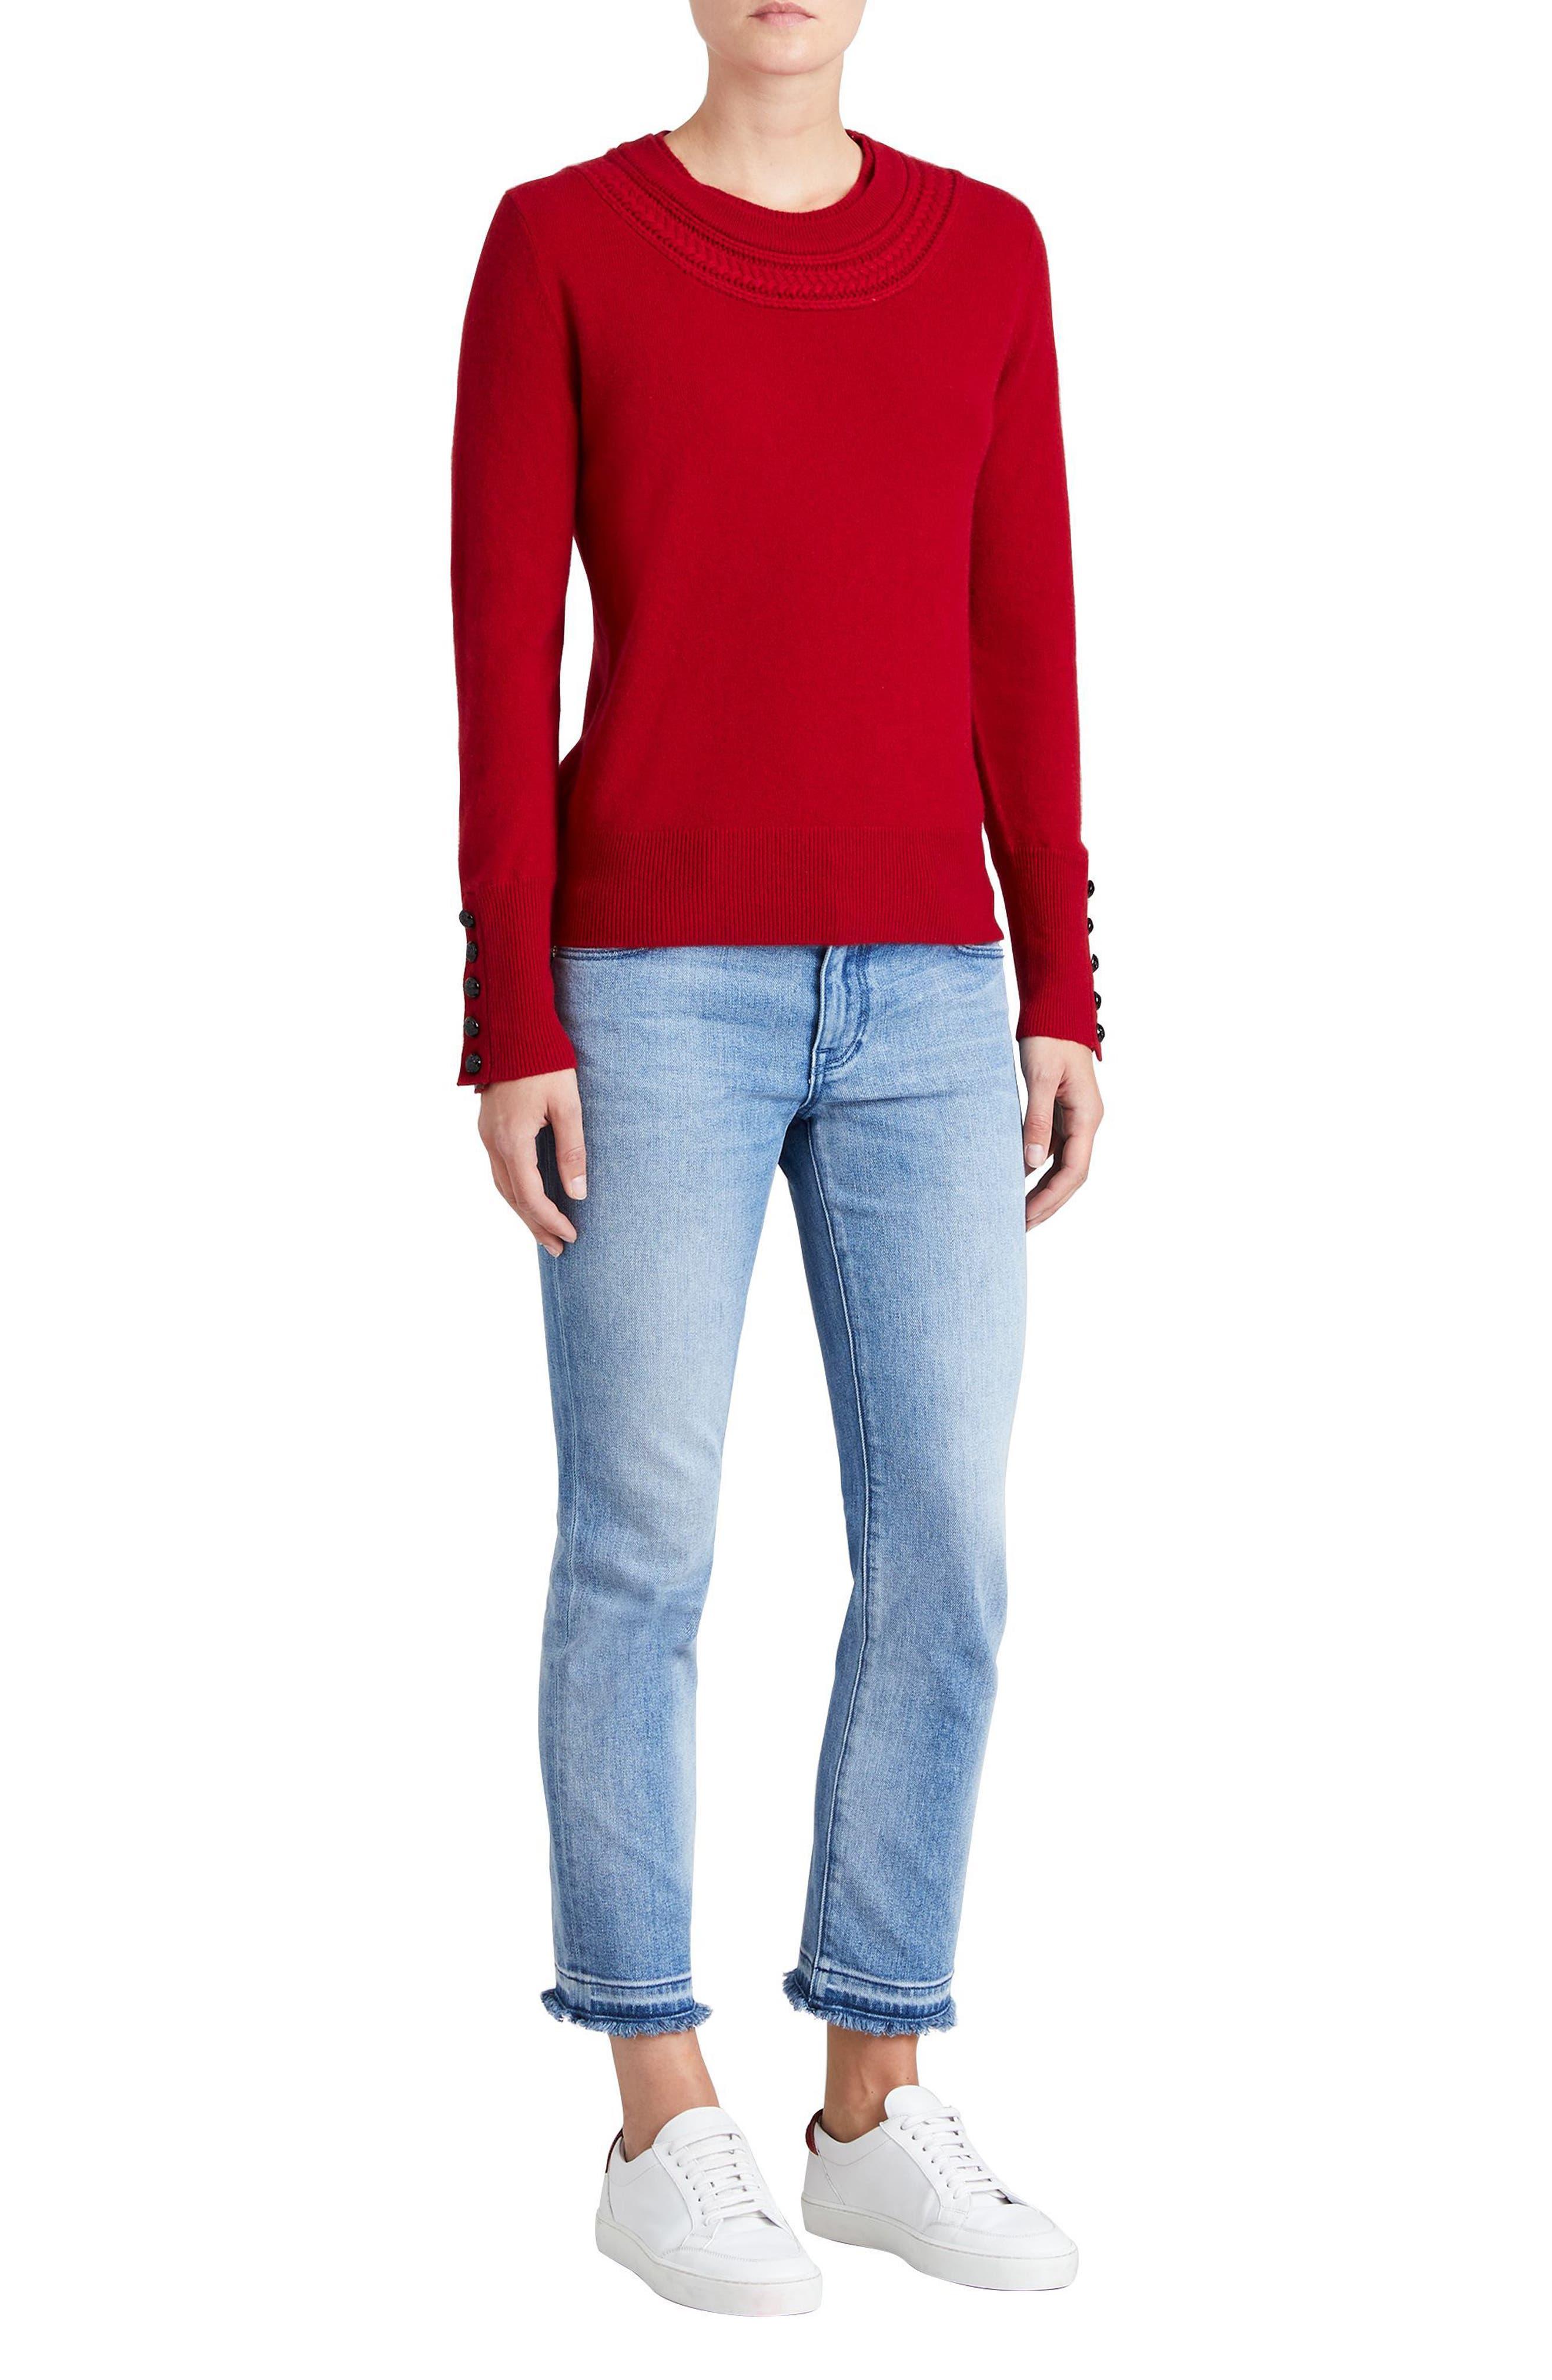 Carapelle Cashmere Sweater,                             Alternate thumbnail 18, color,